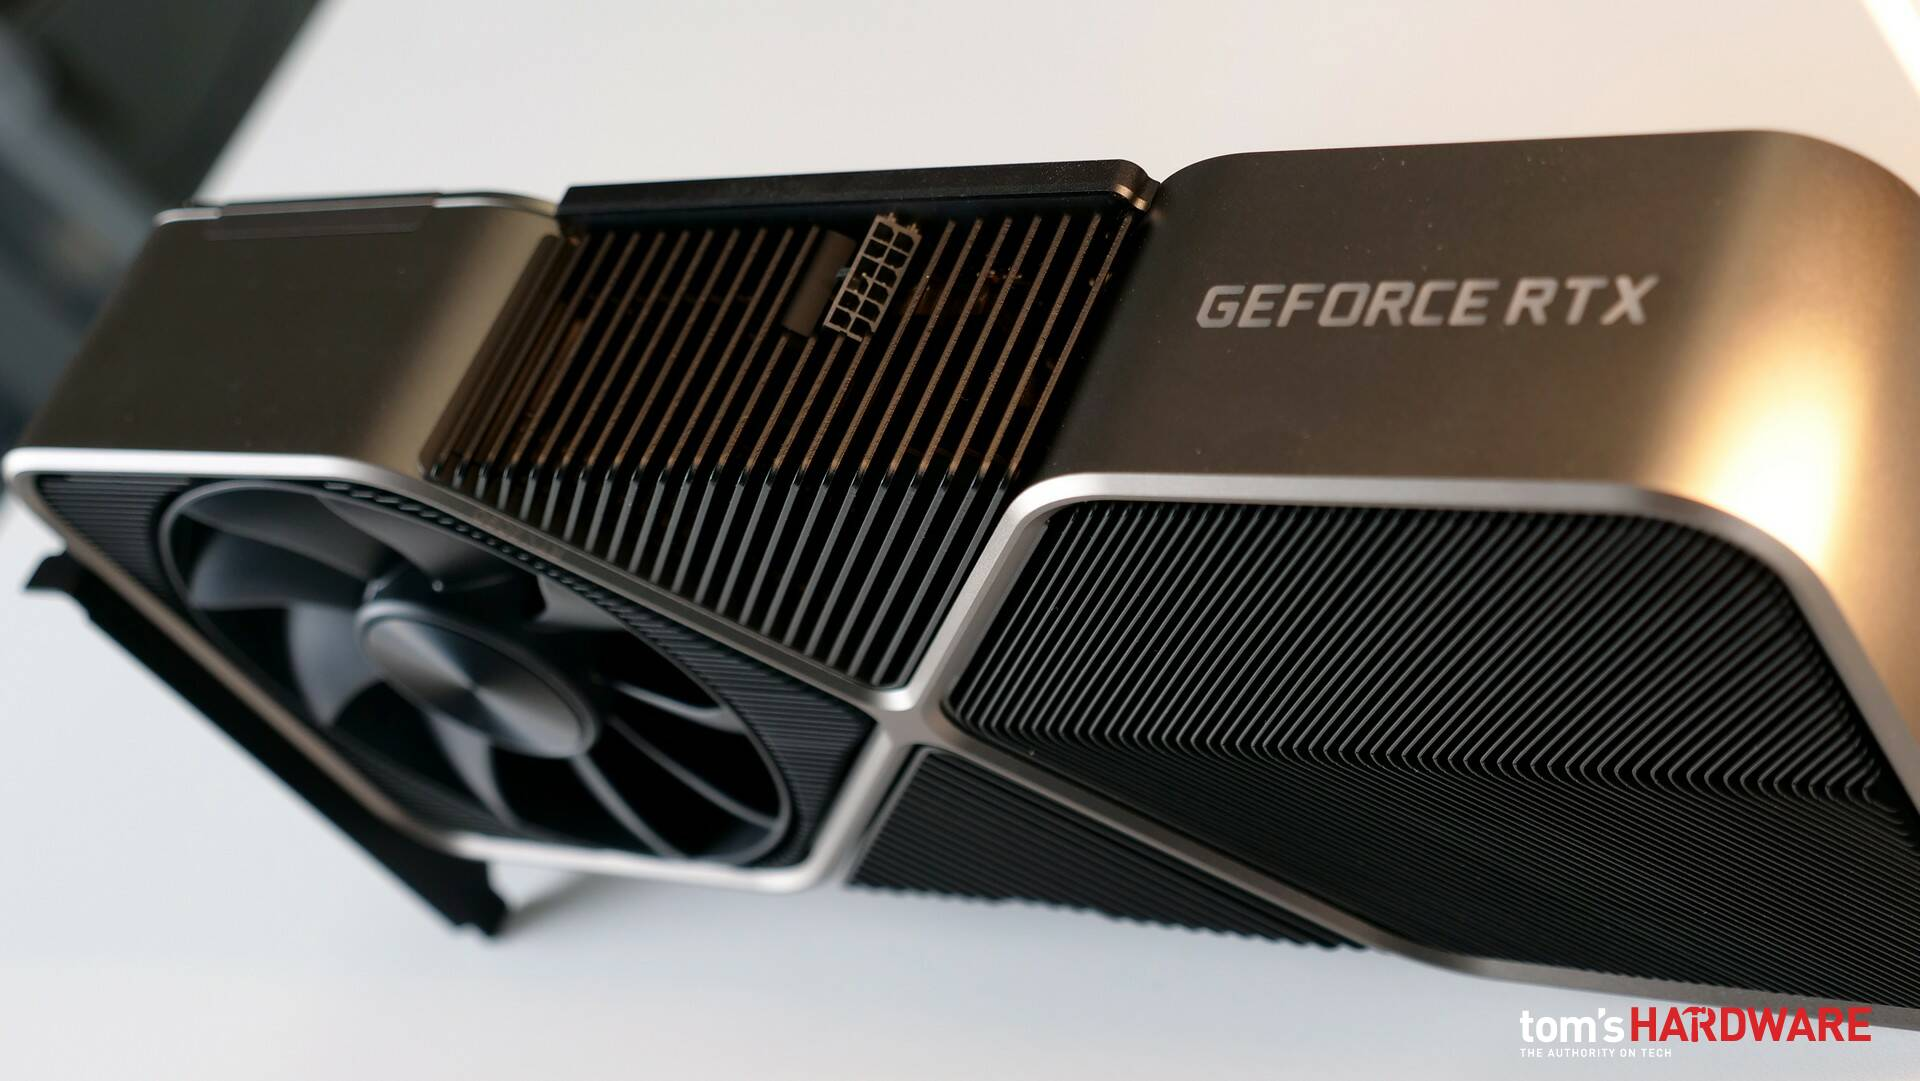 Nvidia RTX 3090 Founders Edition